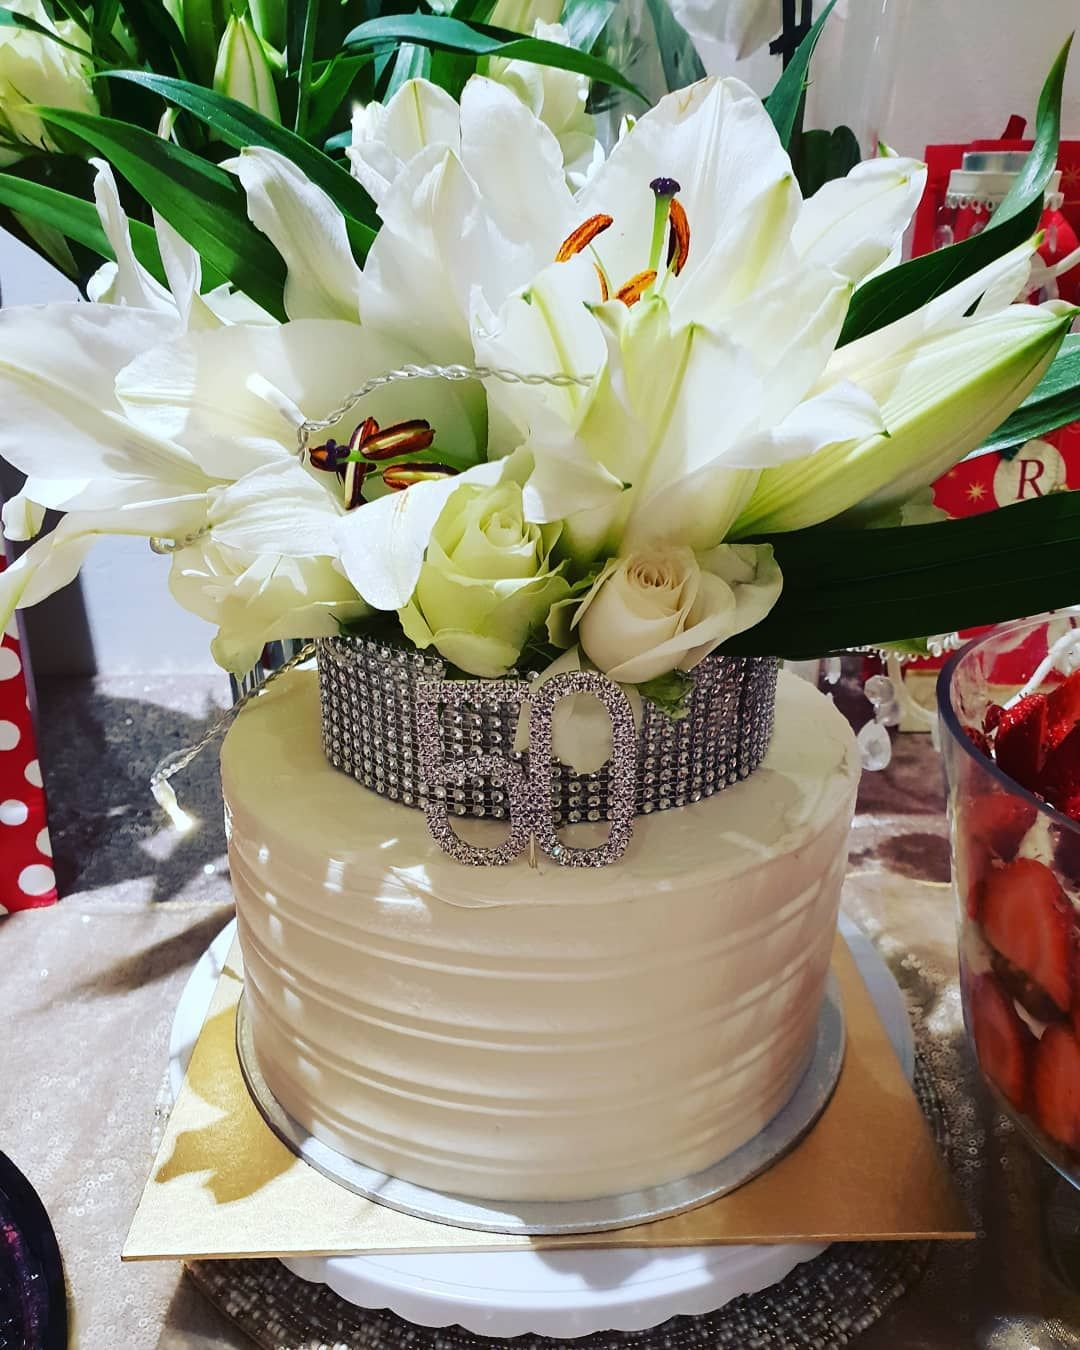 50th Birthday Flower cake 50thbirthday flowers in 2020